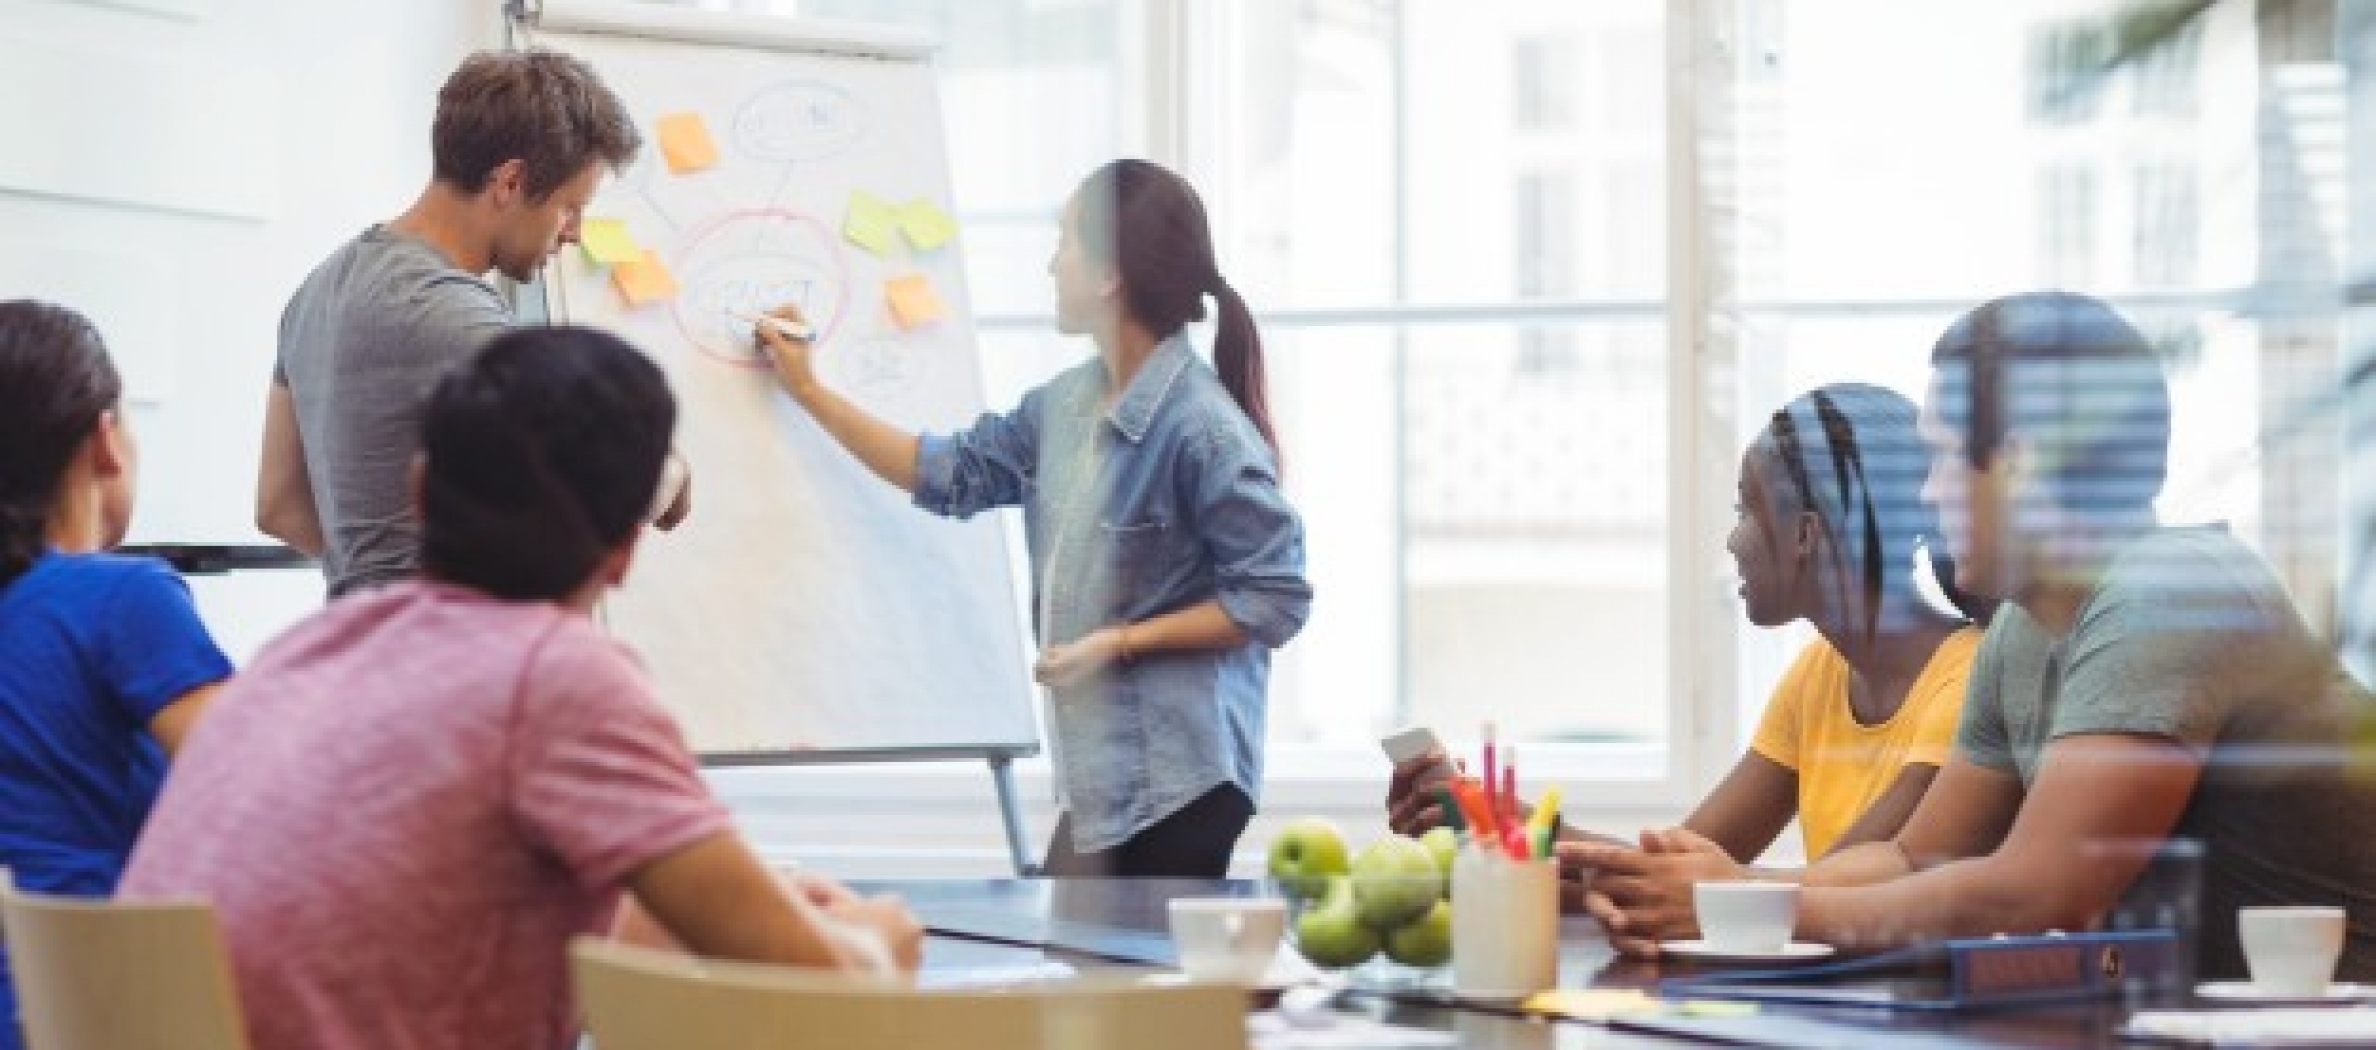 Five easy ways to improve company internal communication